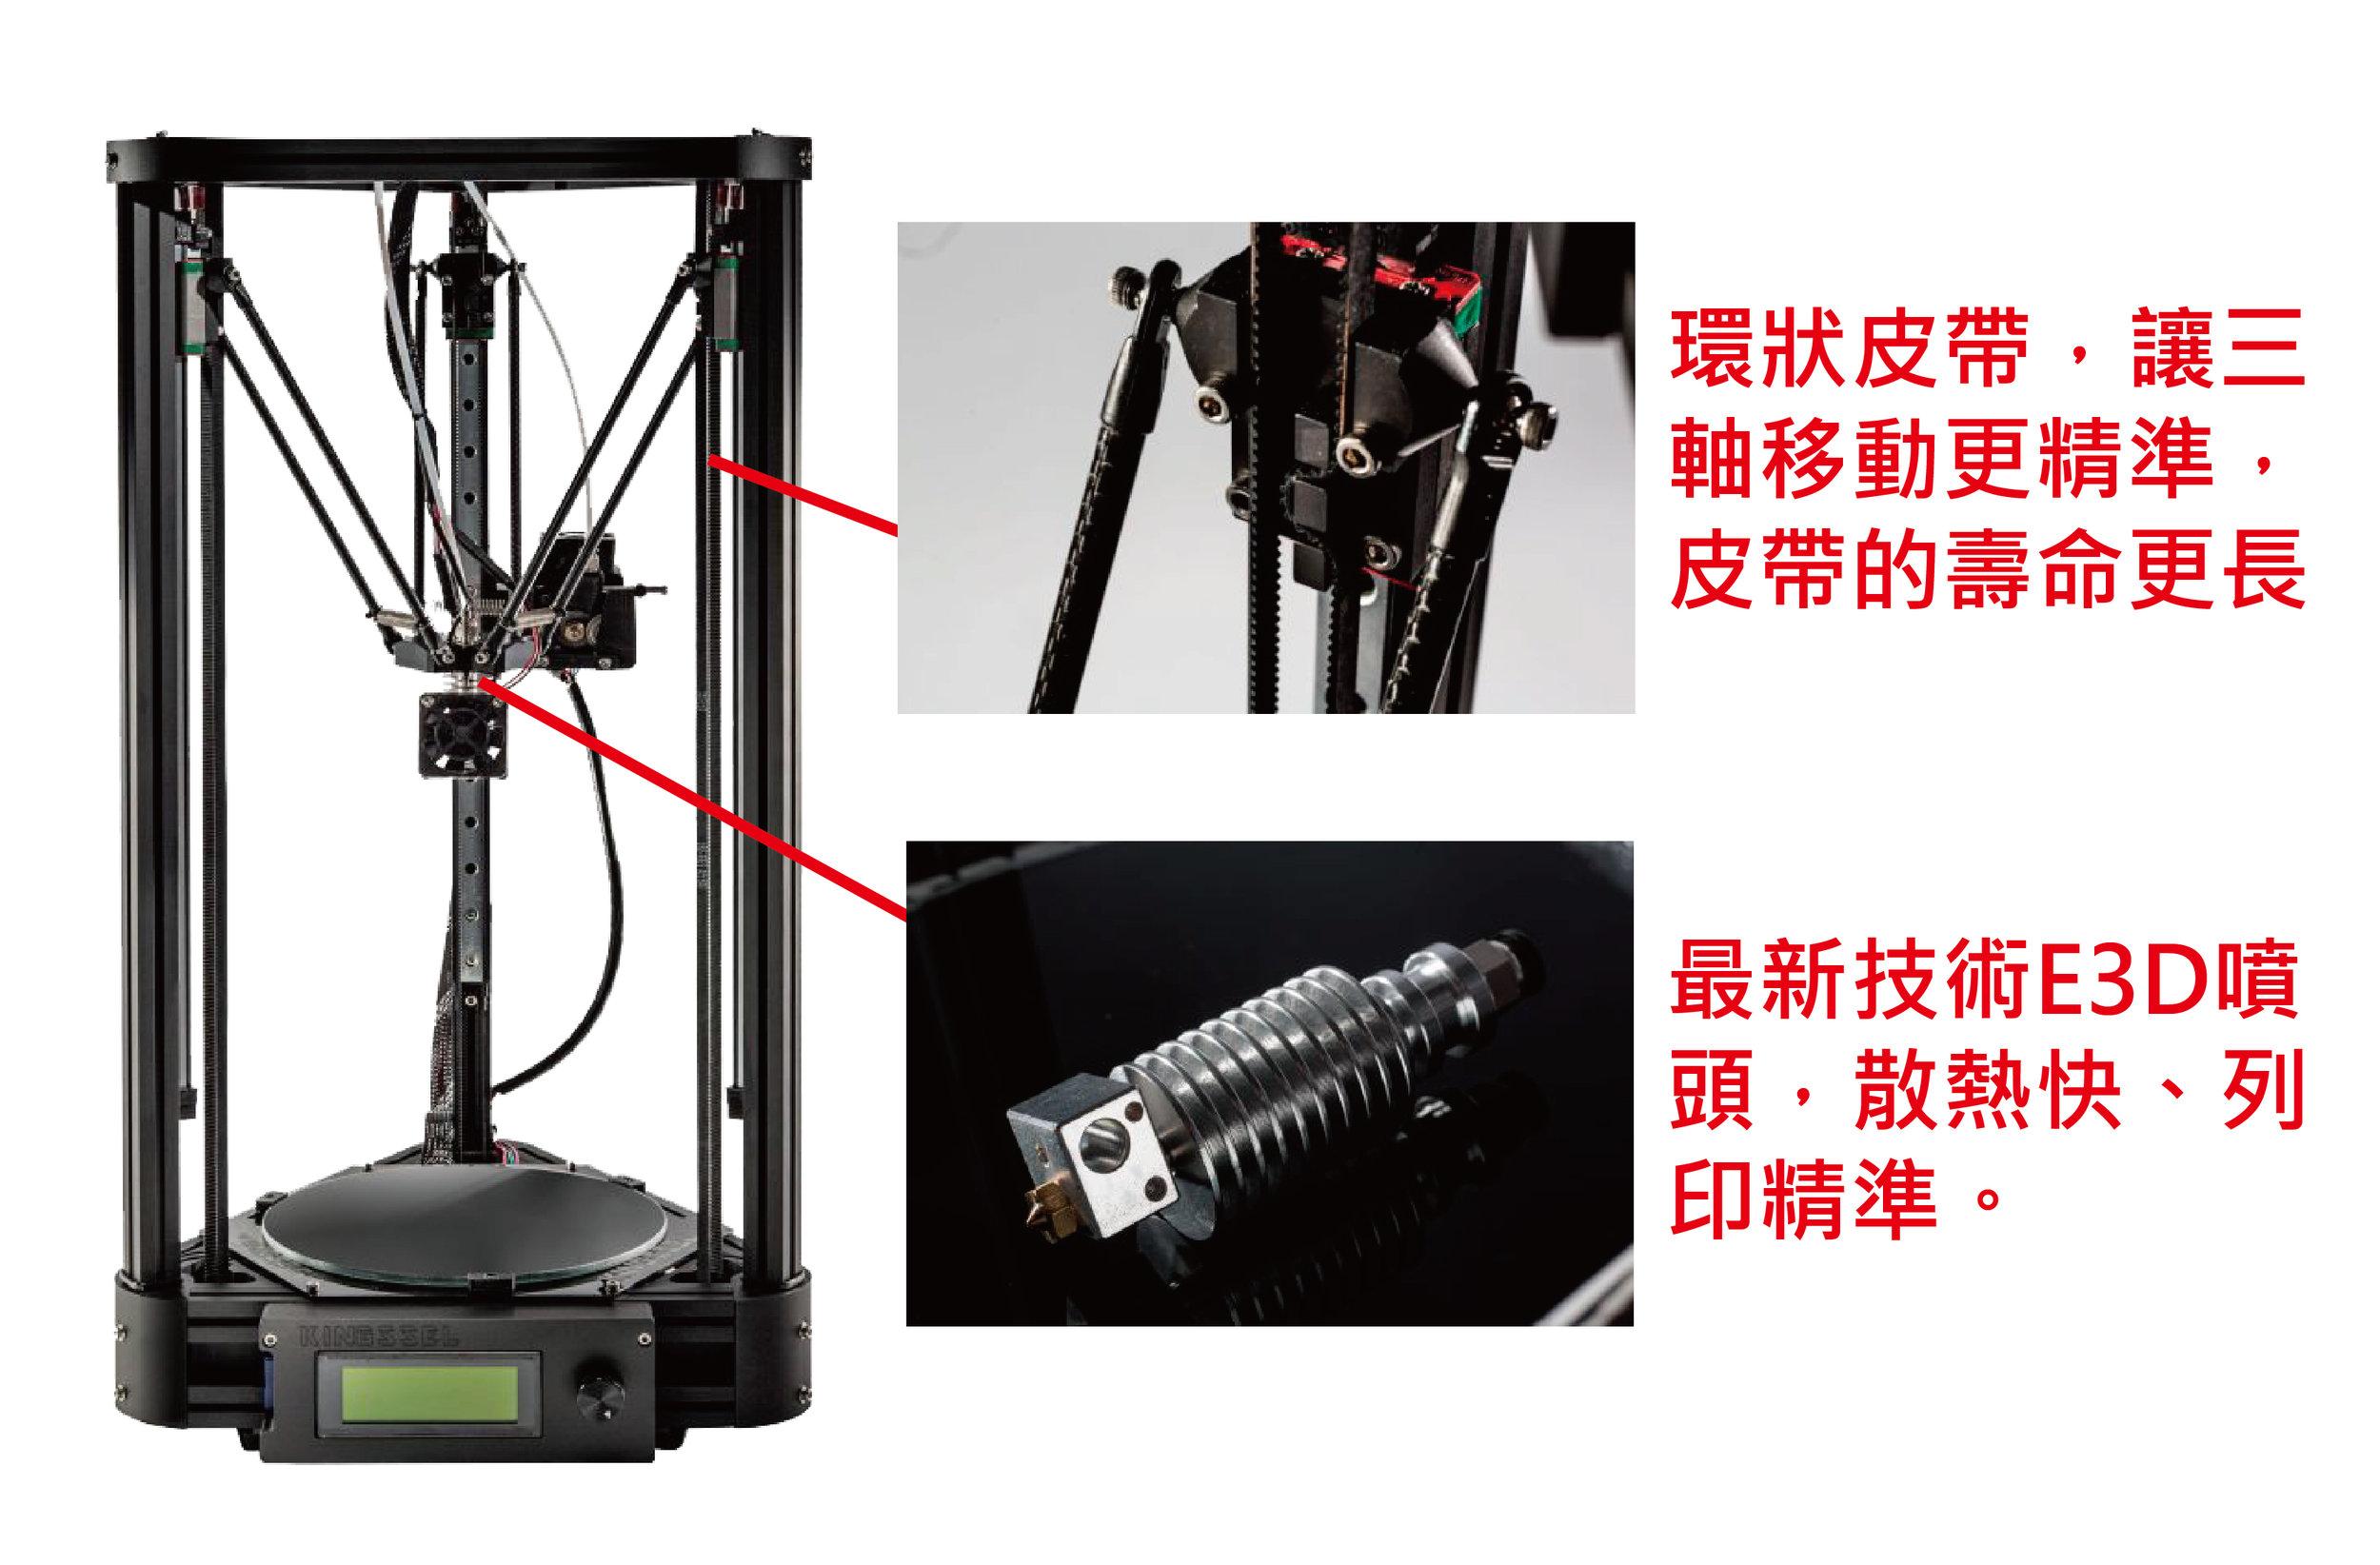 KINGSSEL1820 3D列印機 國王機 p4-01.jpg